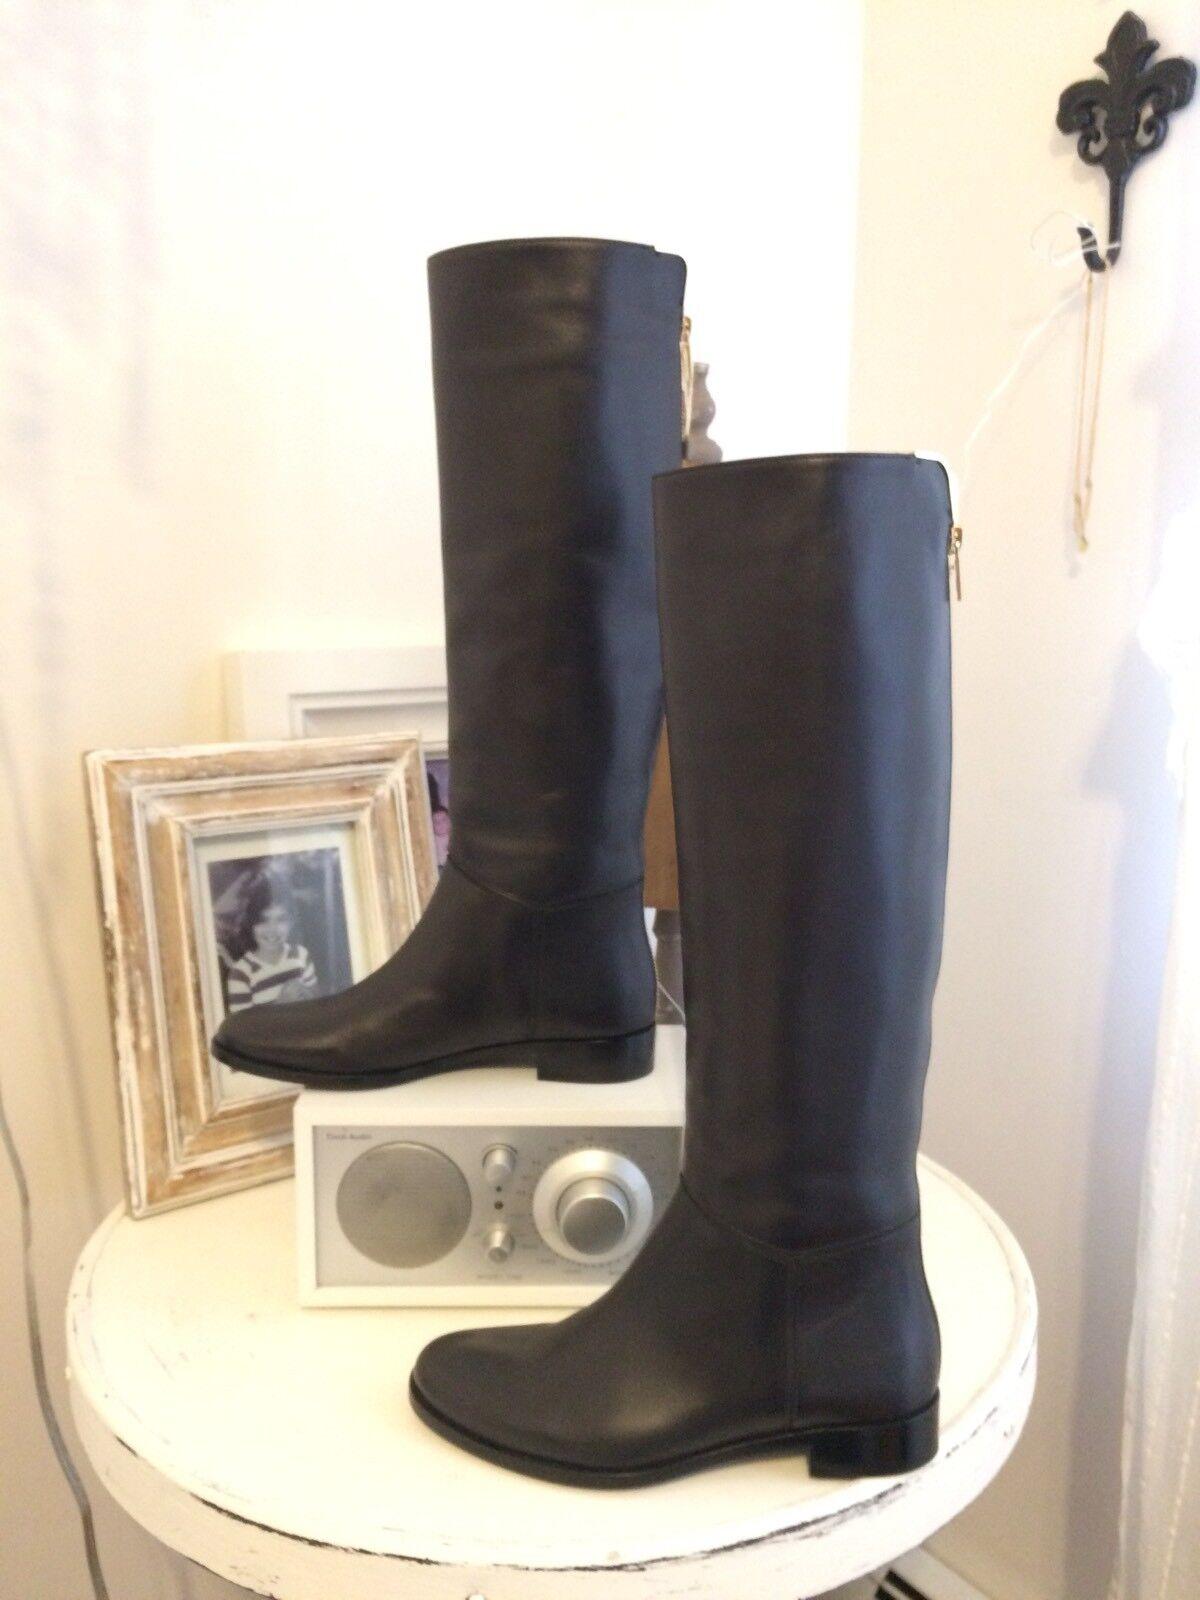 rotUCED  LANVIN Stiefel PRICED TO SELL  schwarz leather Größe 5.5 US, 35.5 EU